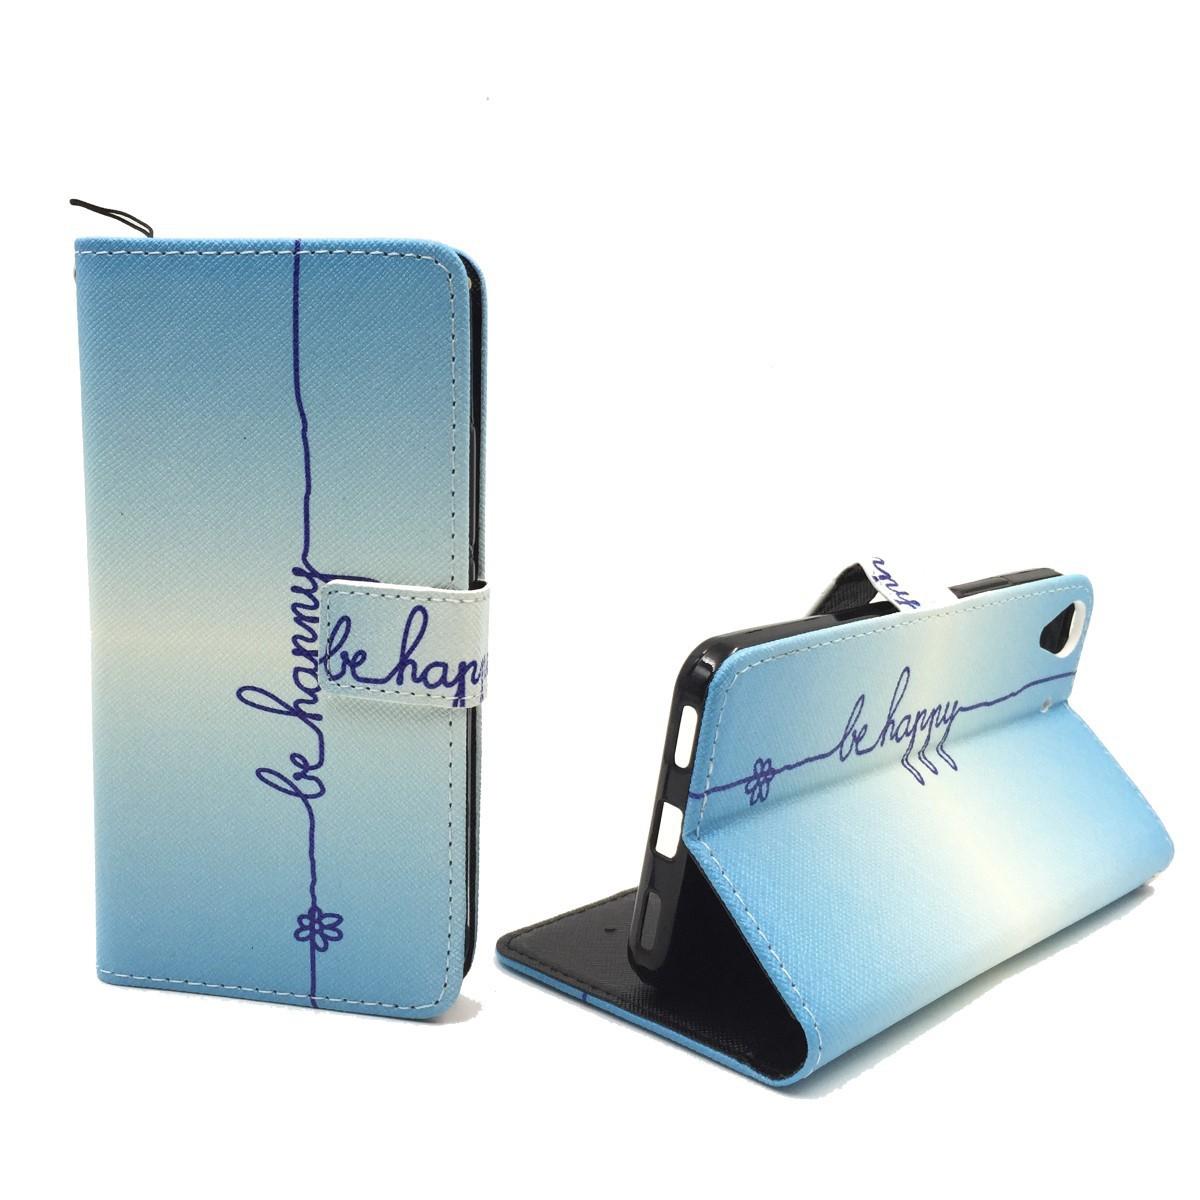 handyh lle tasche f r handy huawei y6 schriftzug be happy blau. Black Bedroom Furniture Sets. Home Design Ideas